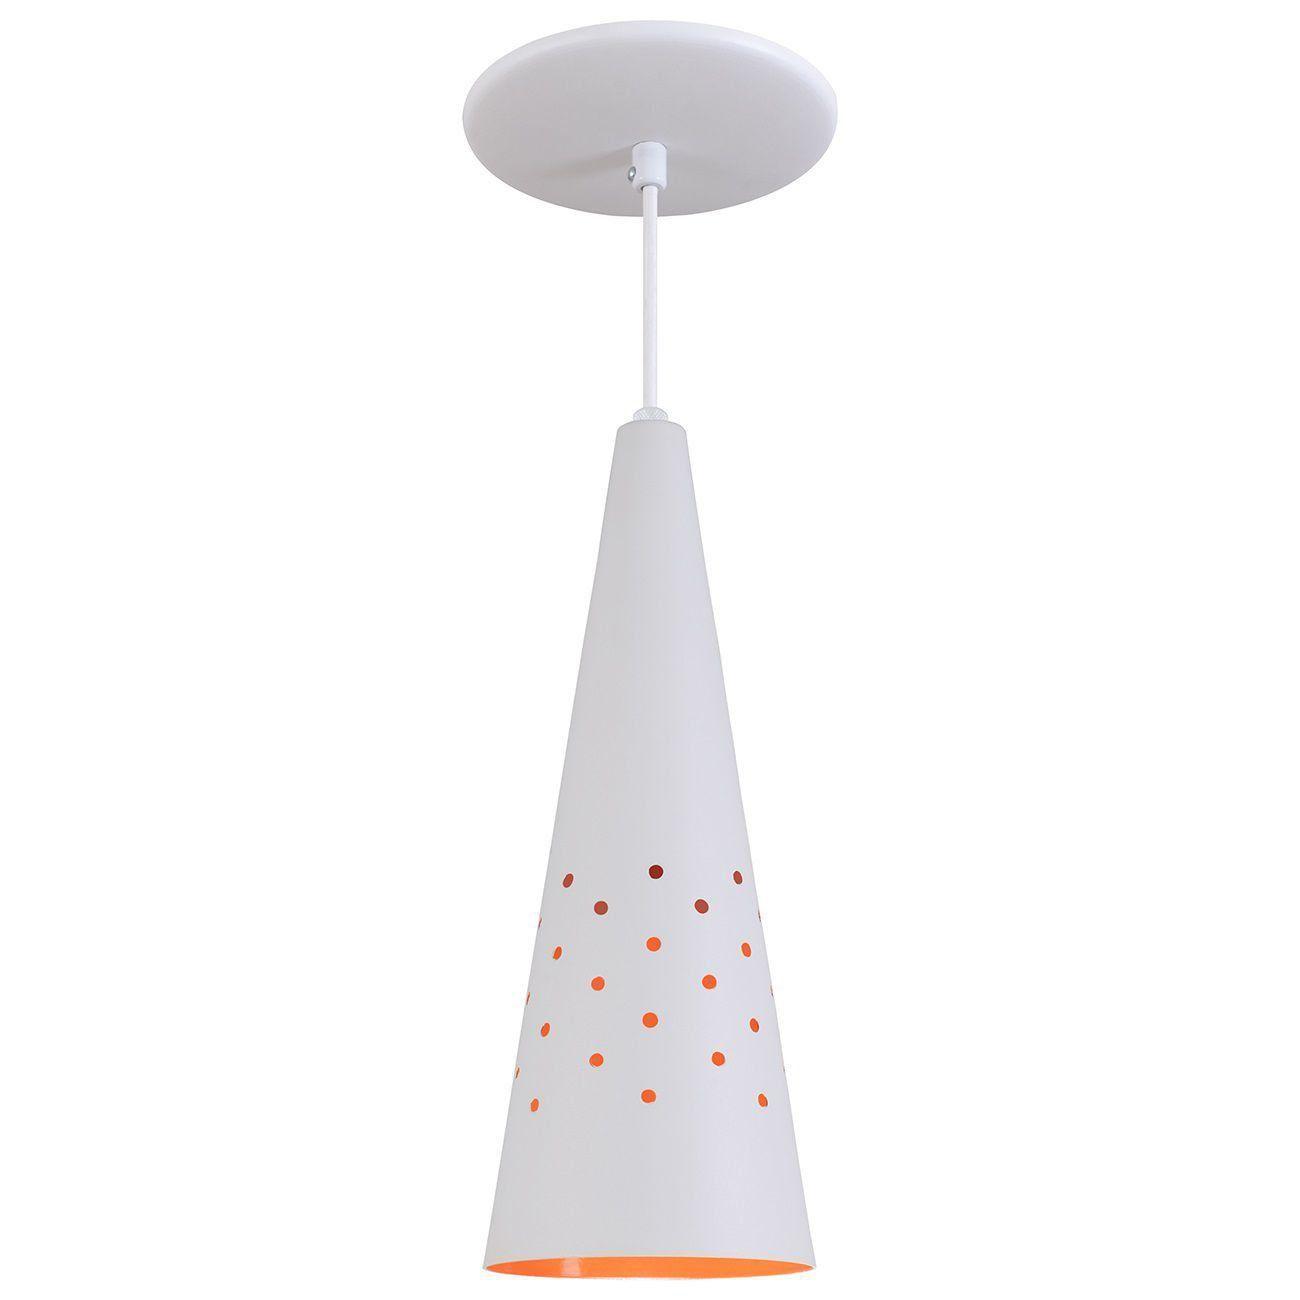 Pendente Cone Furado Luminária Lustre Alumínio Branco Textura C/ Laranja - Rei Da Iluminação